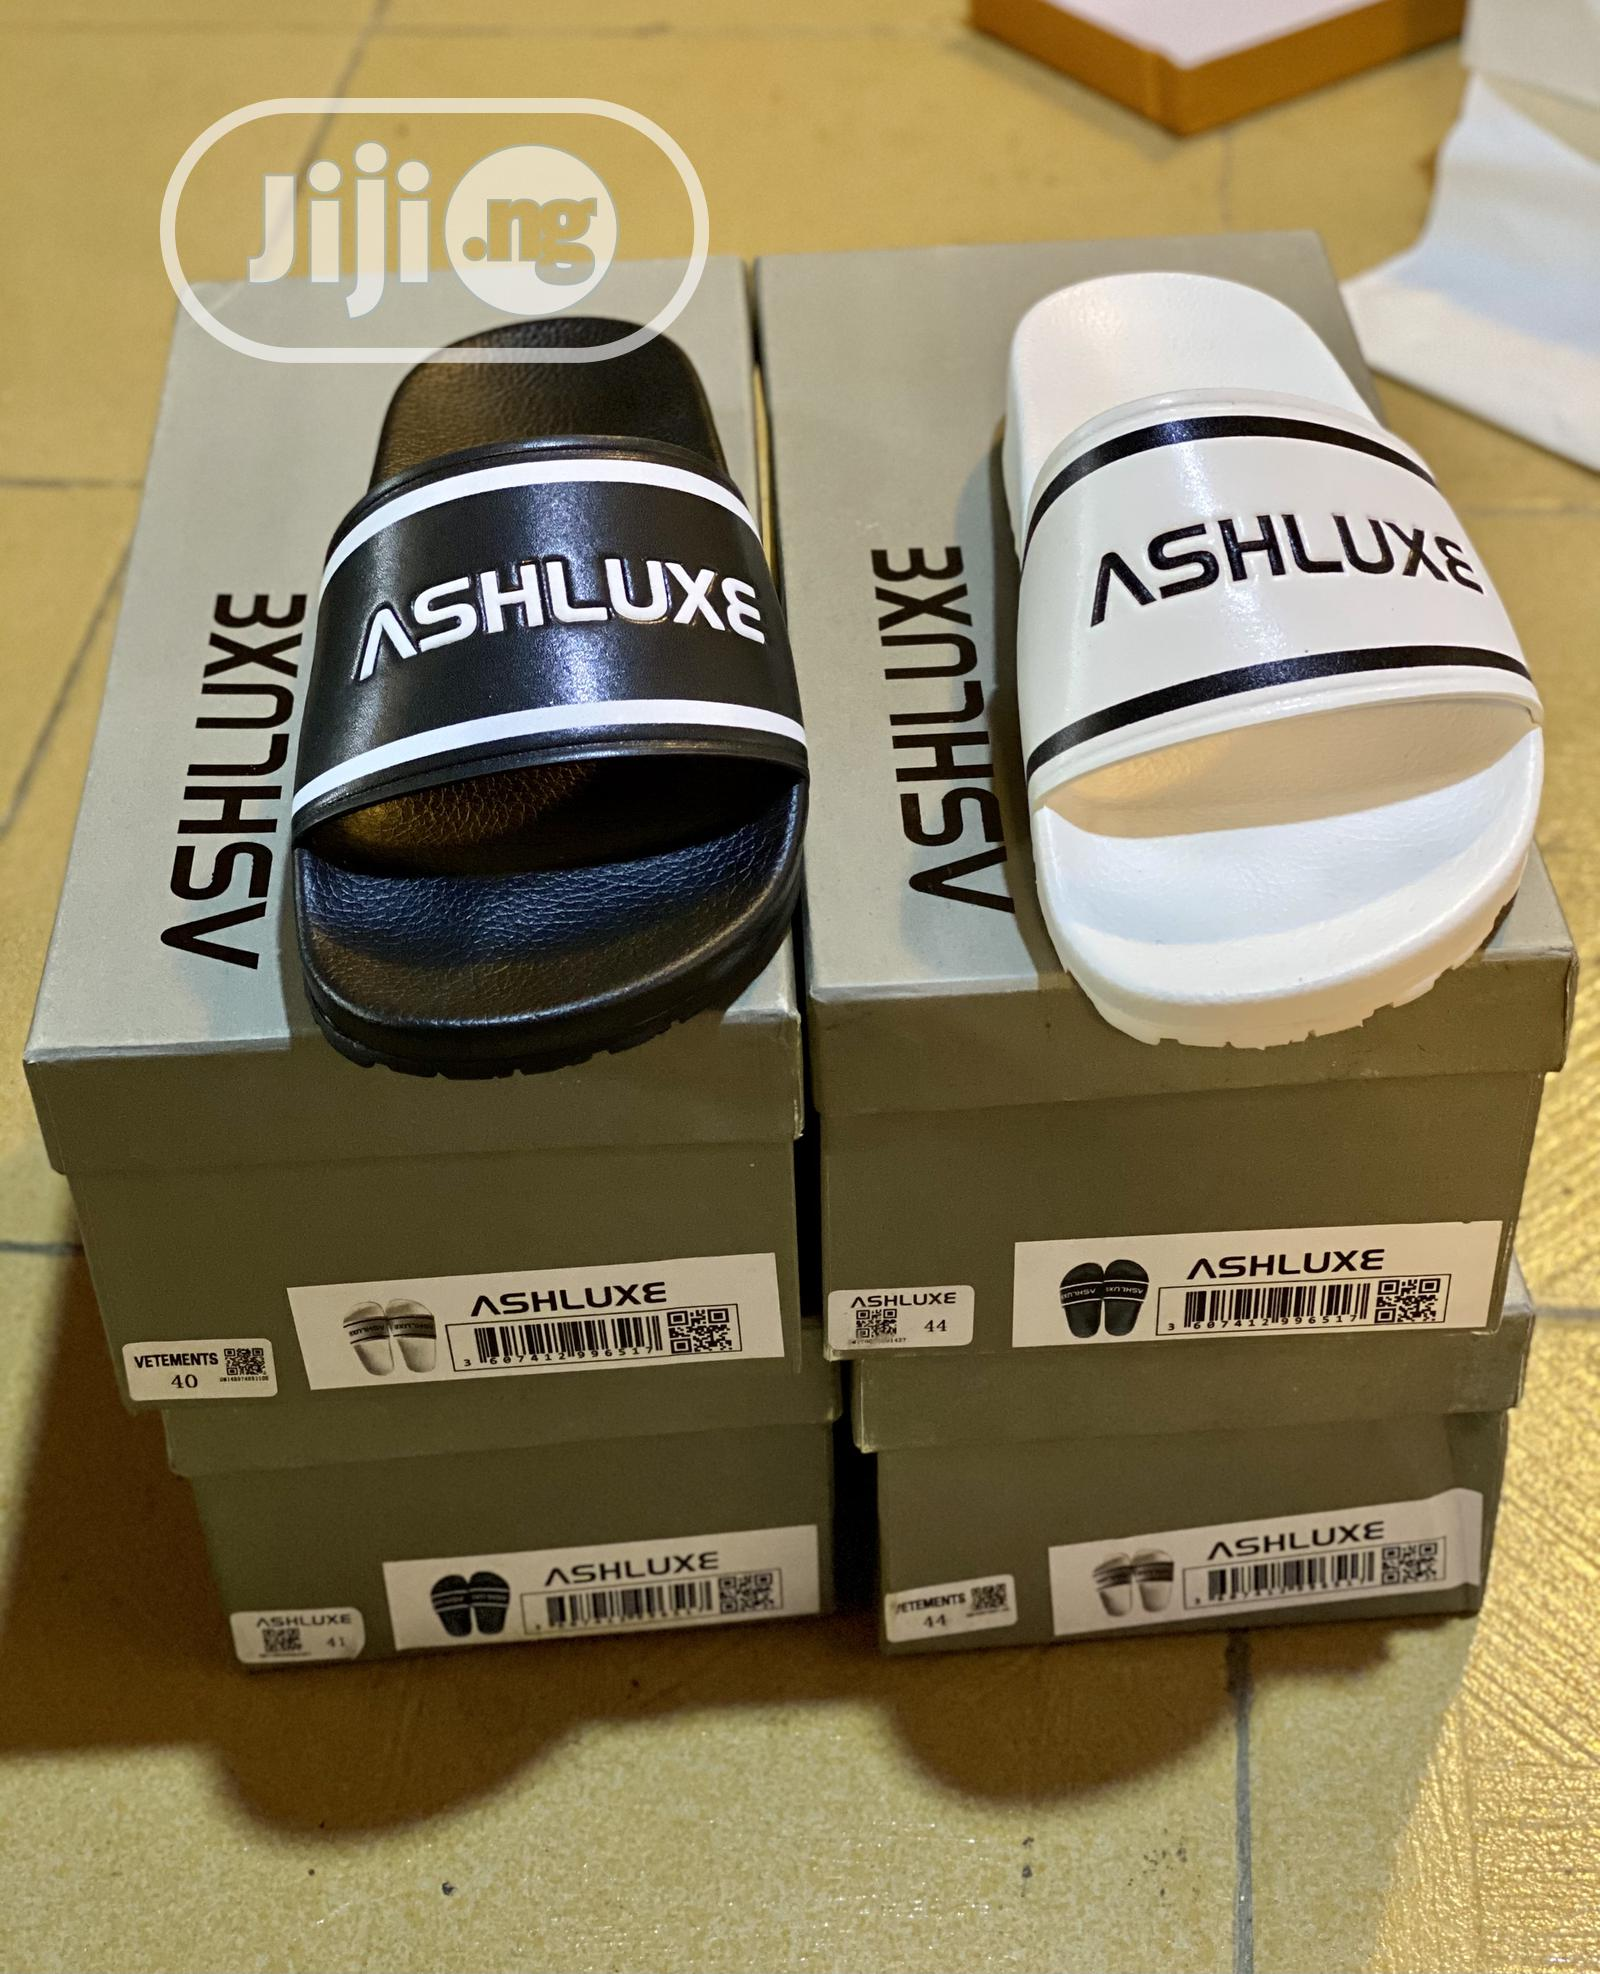 Original Ashluxe Slides With Box.